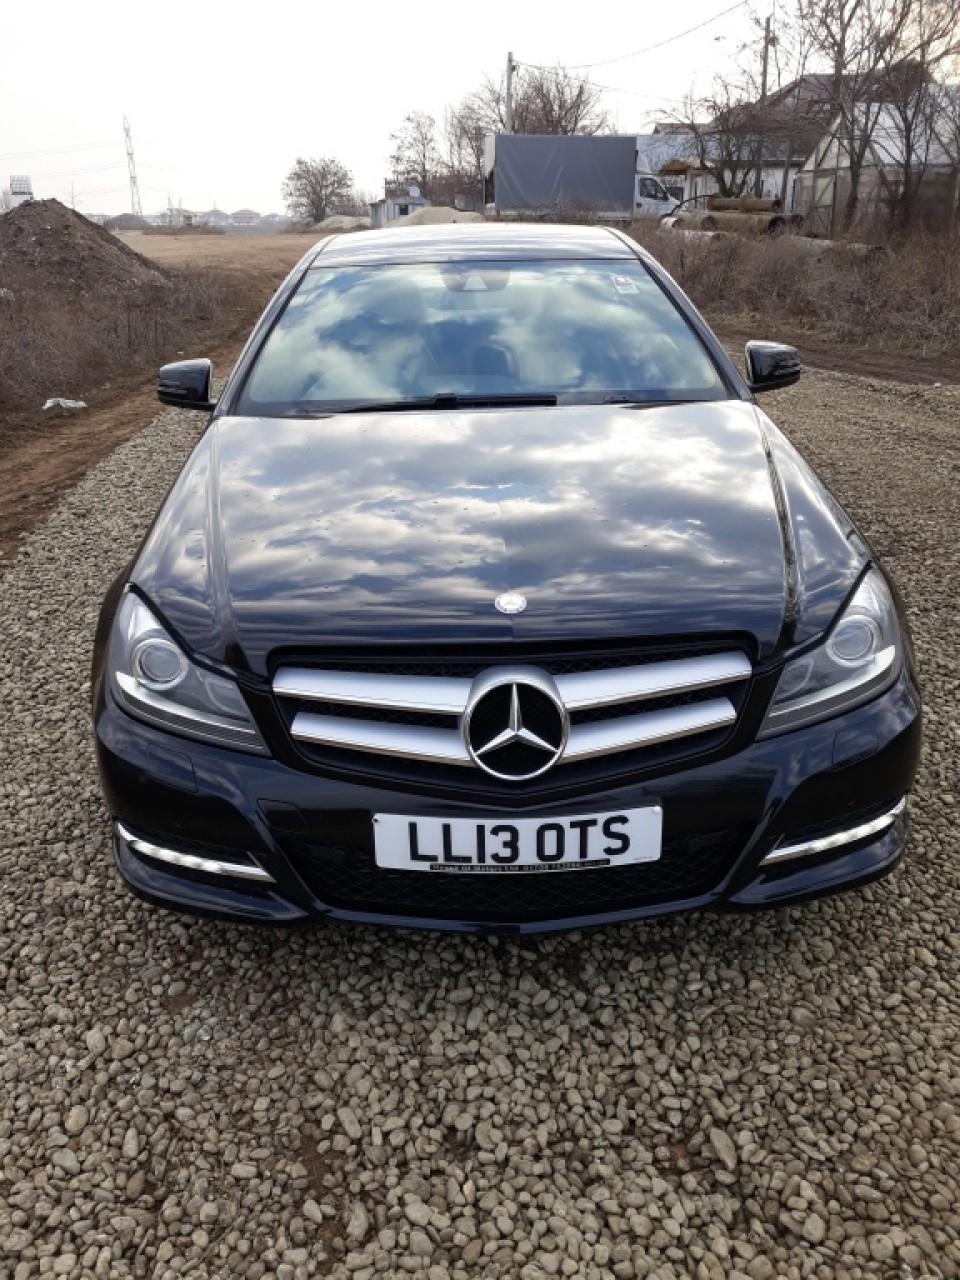 Fuzeta dreapta spate Mercedes C-CLASS W204 2013 coupe 2.2